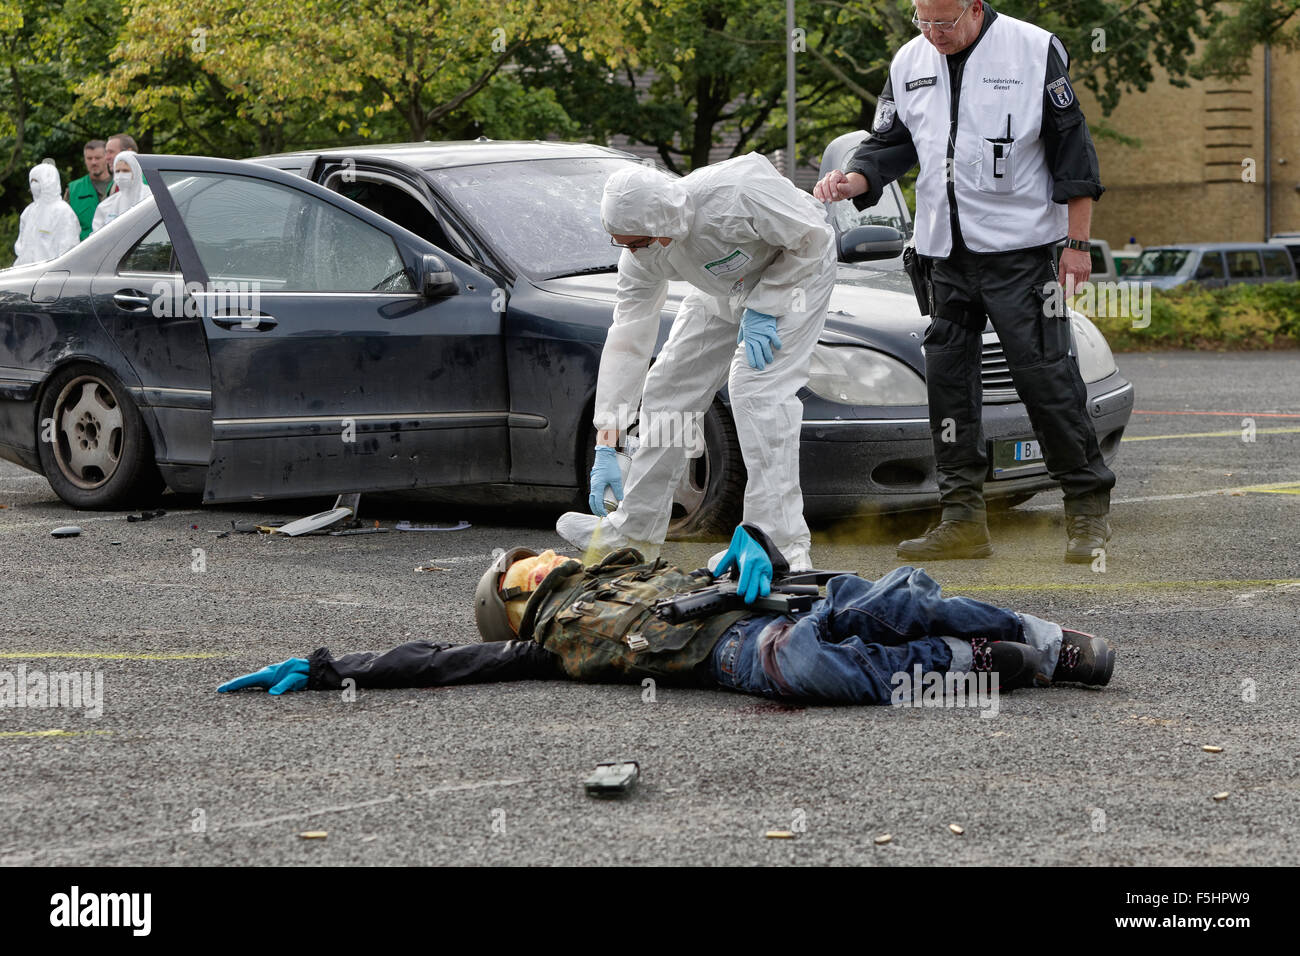 Berlin Germany Polizeiuebung Terrorist Attack Stock